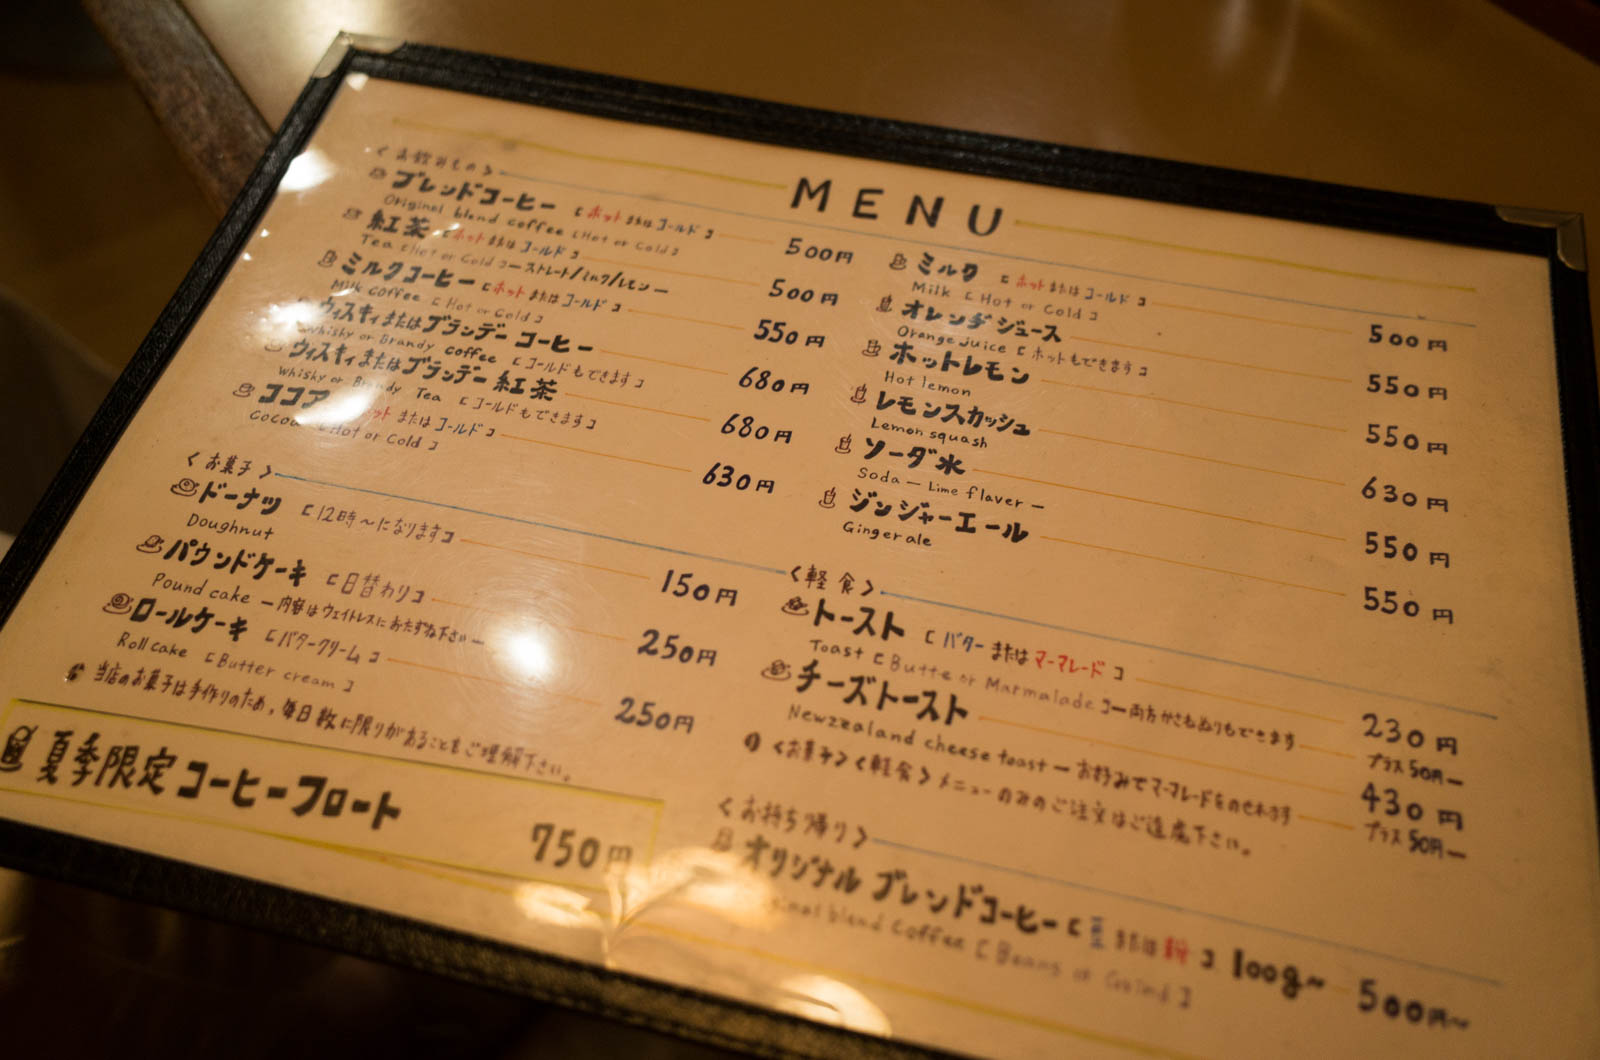 京都で夜カフェ河原町三条・老舗喫茶店「六曜社」